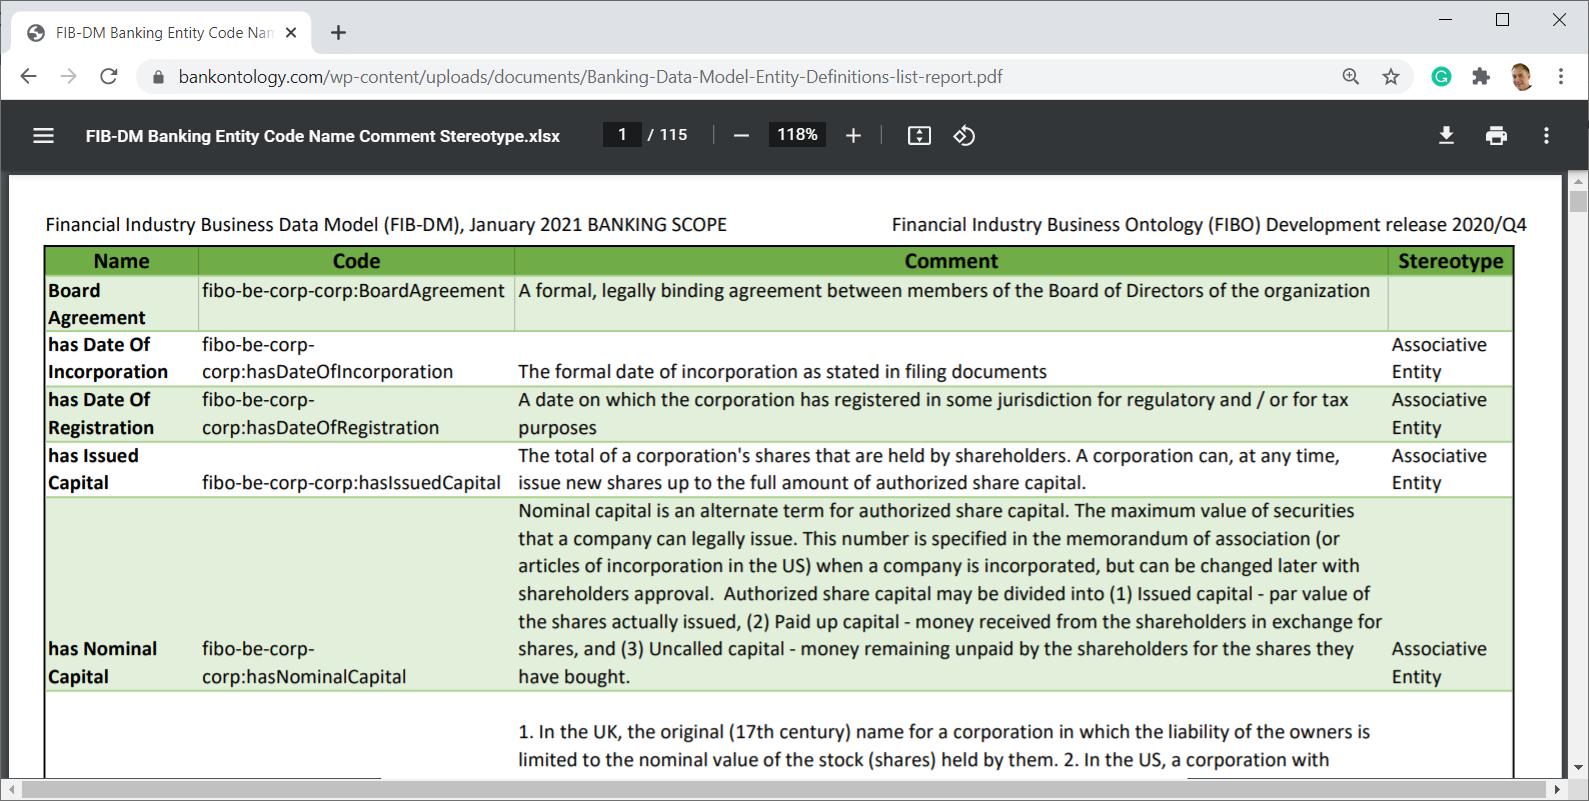 Banking Data Model - Entity list report (PDF)